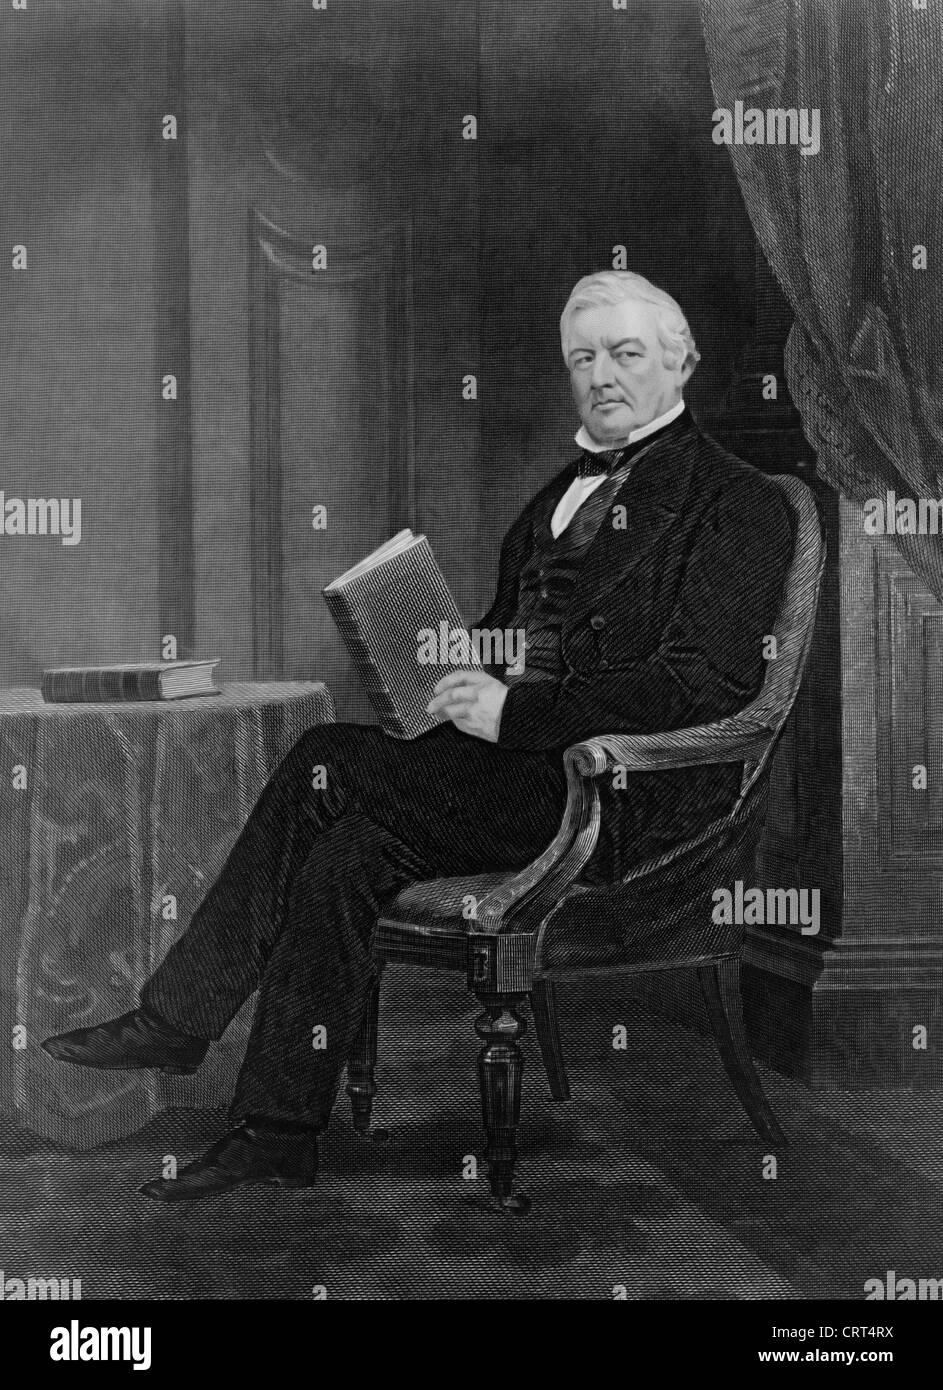 Millard Fillmore, 13th President of the USA, 1850-1853 Stock Photo